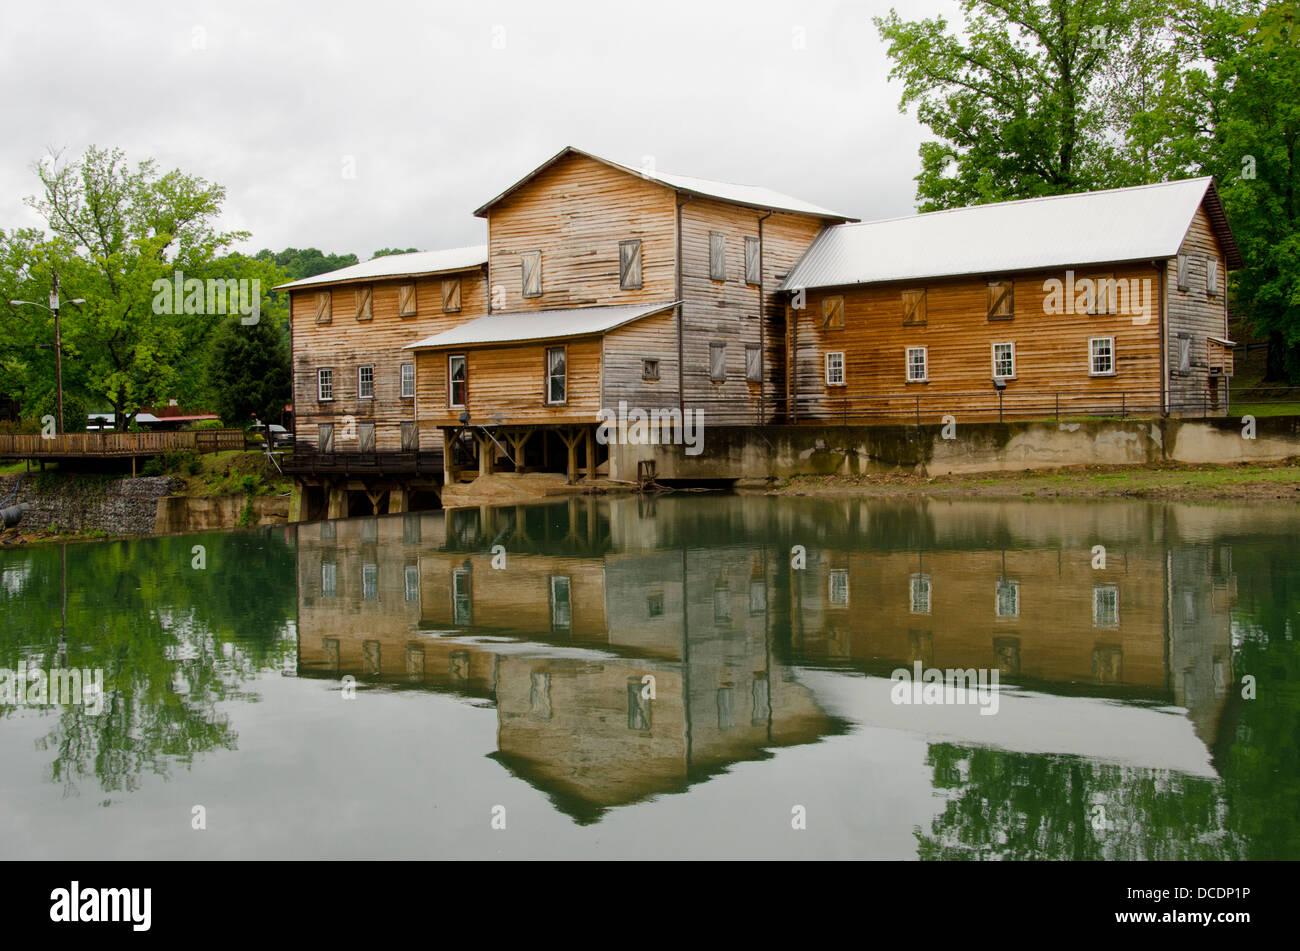 23 Best Loretta Lynn's Plantation Home images | Farmhouse ...